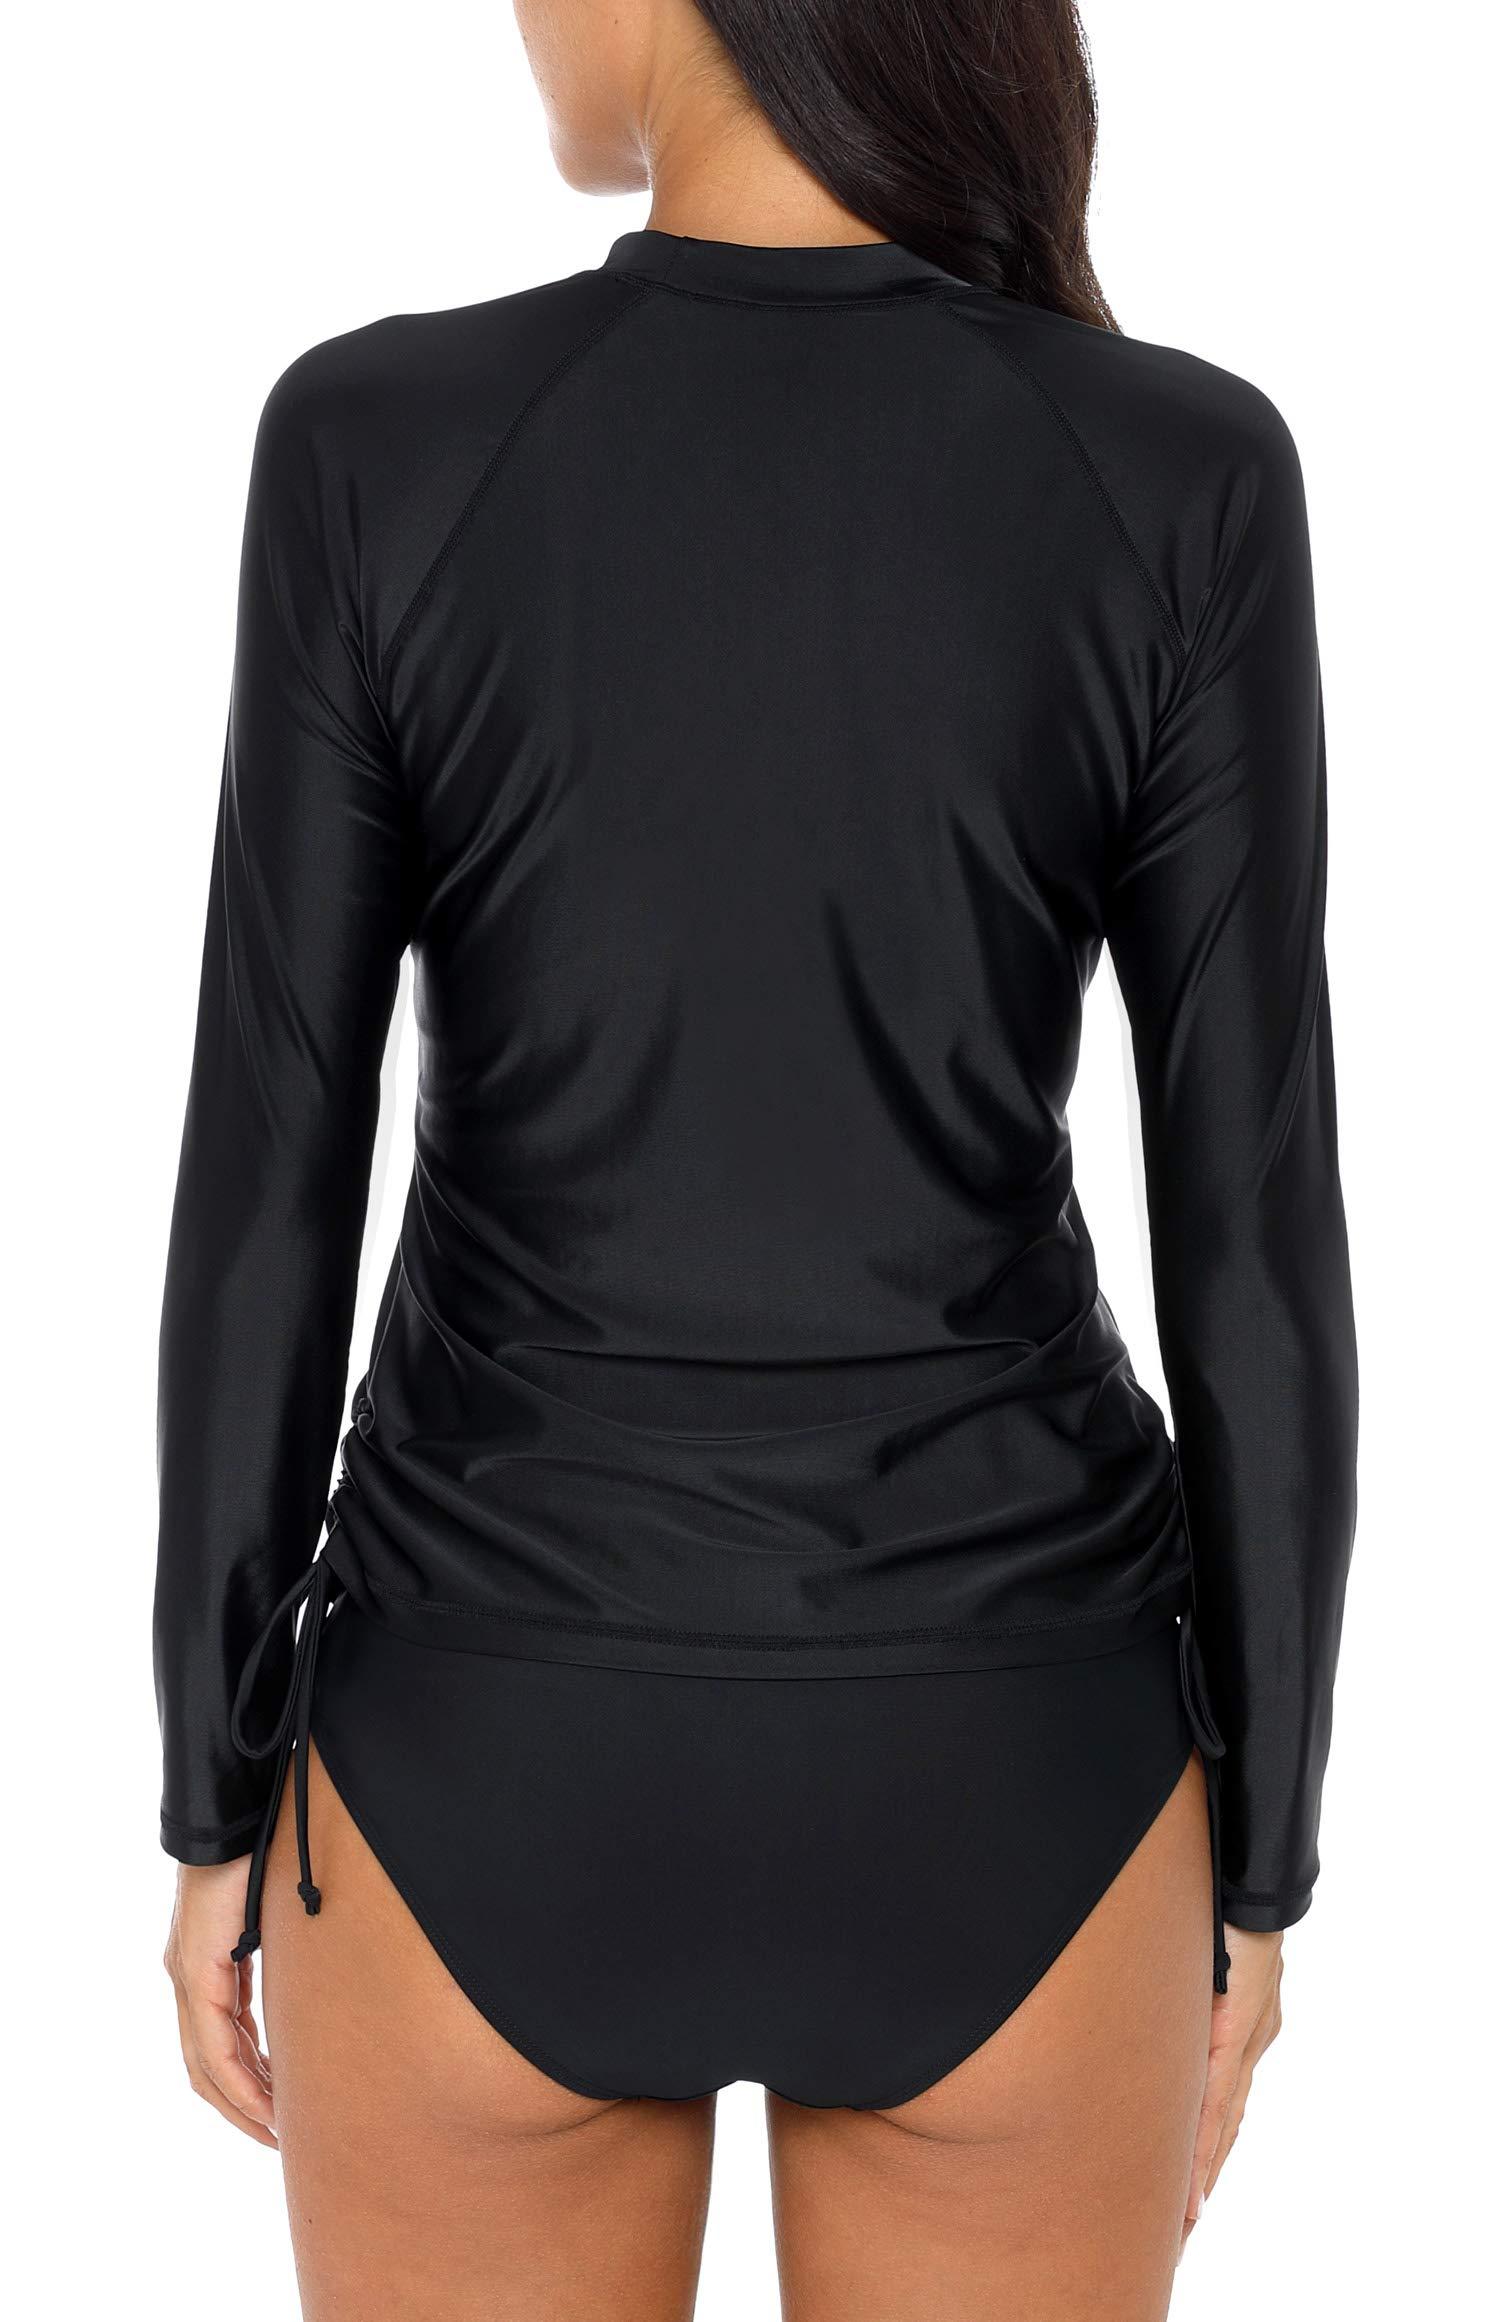 ALove Woman Long Sleeve Swim Shirt Quick Dry Rashguard Swim Top Black M by ALove (Image #3)